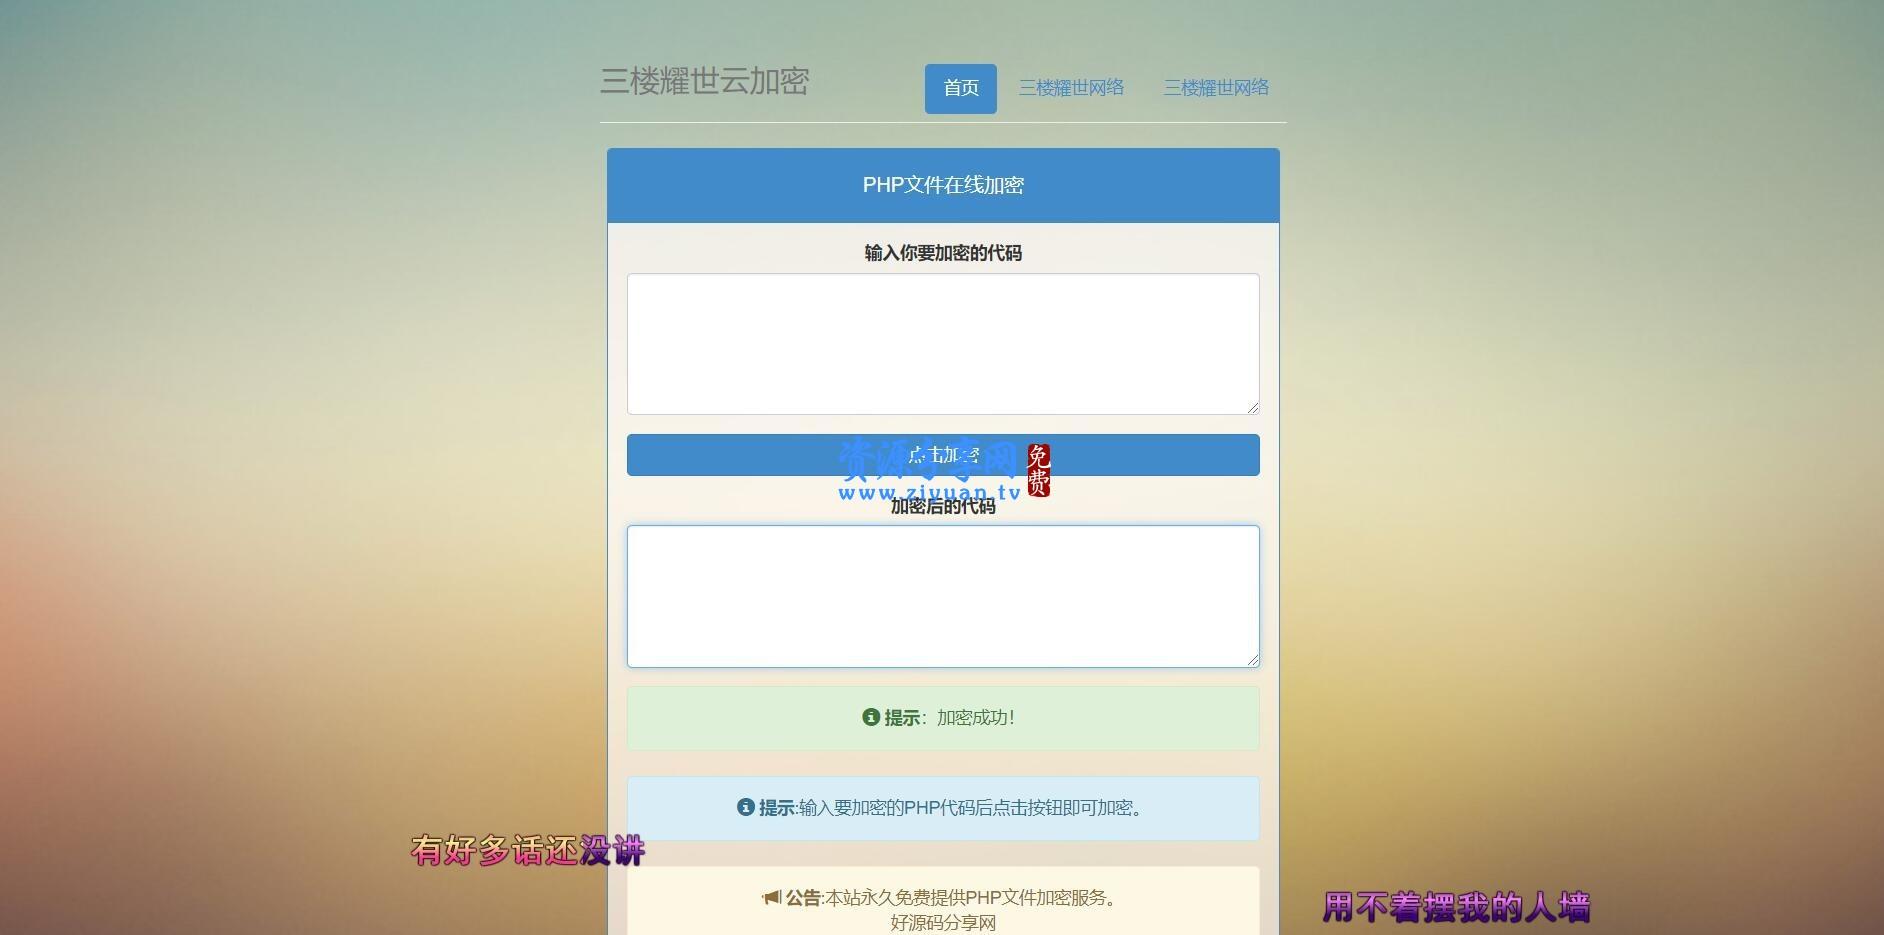 PHP 文件在线加密源码